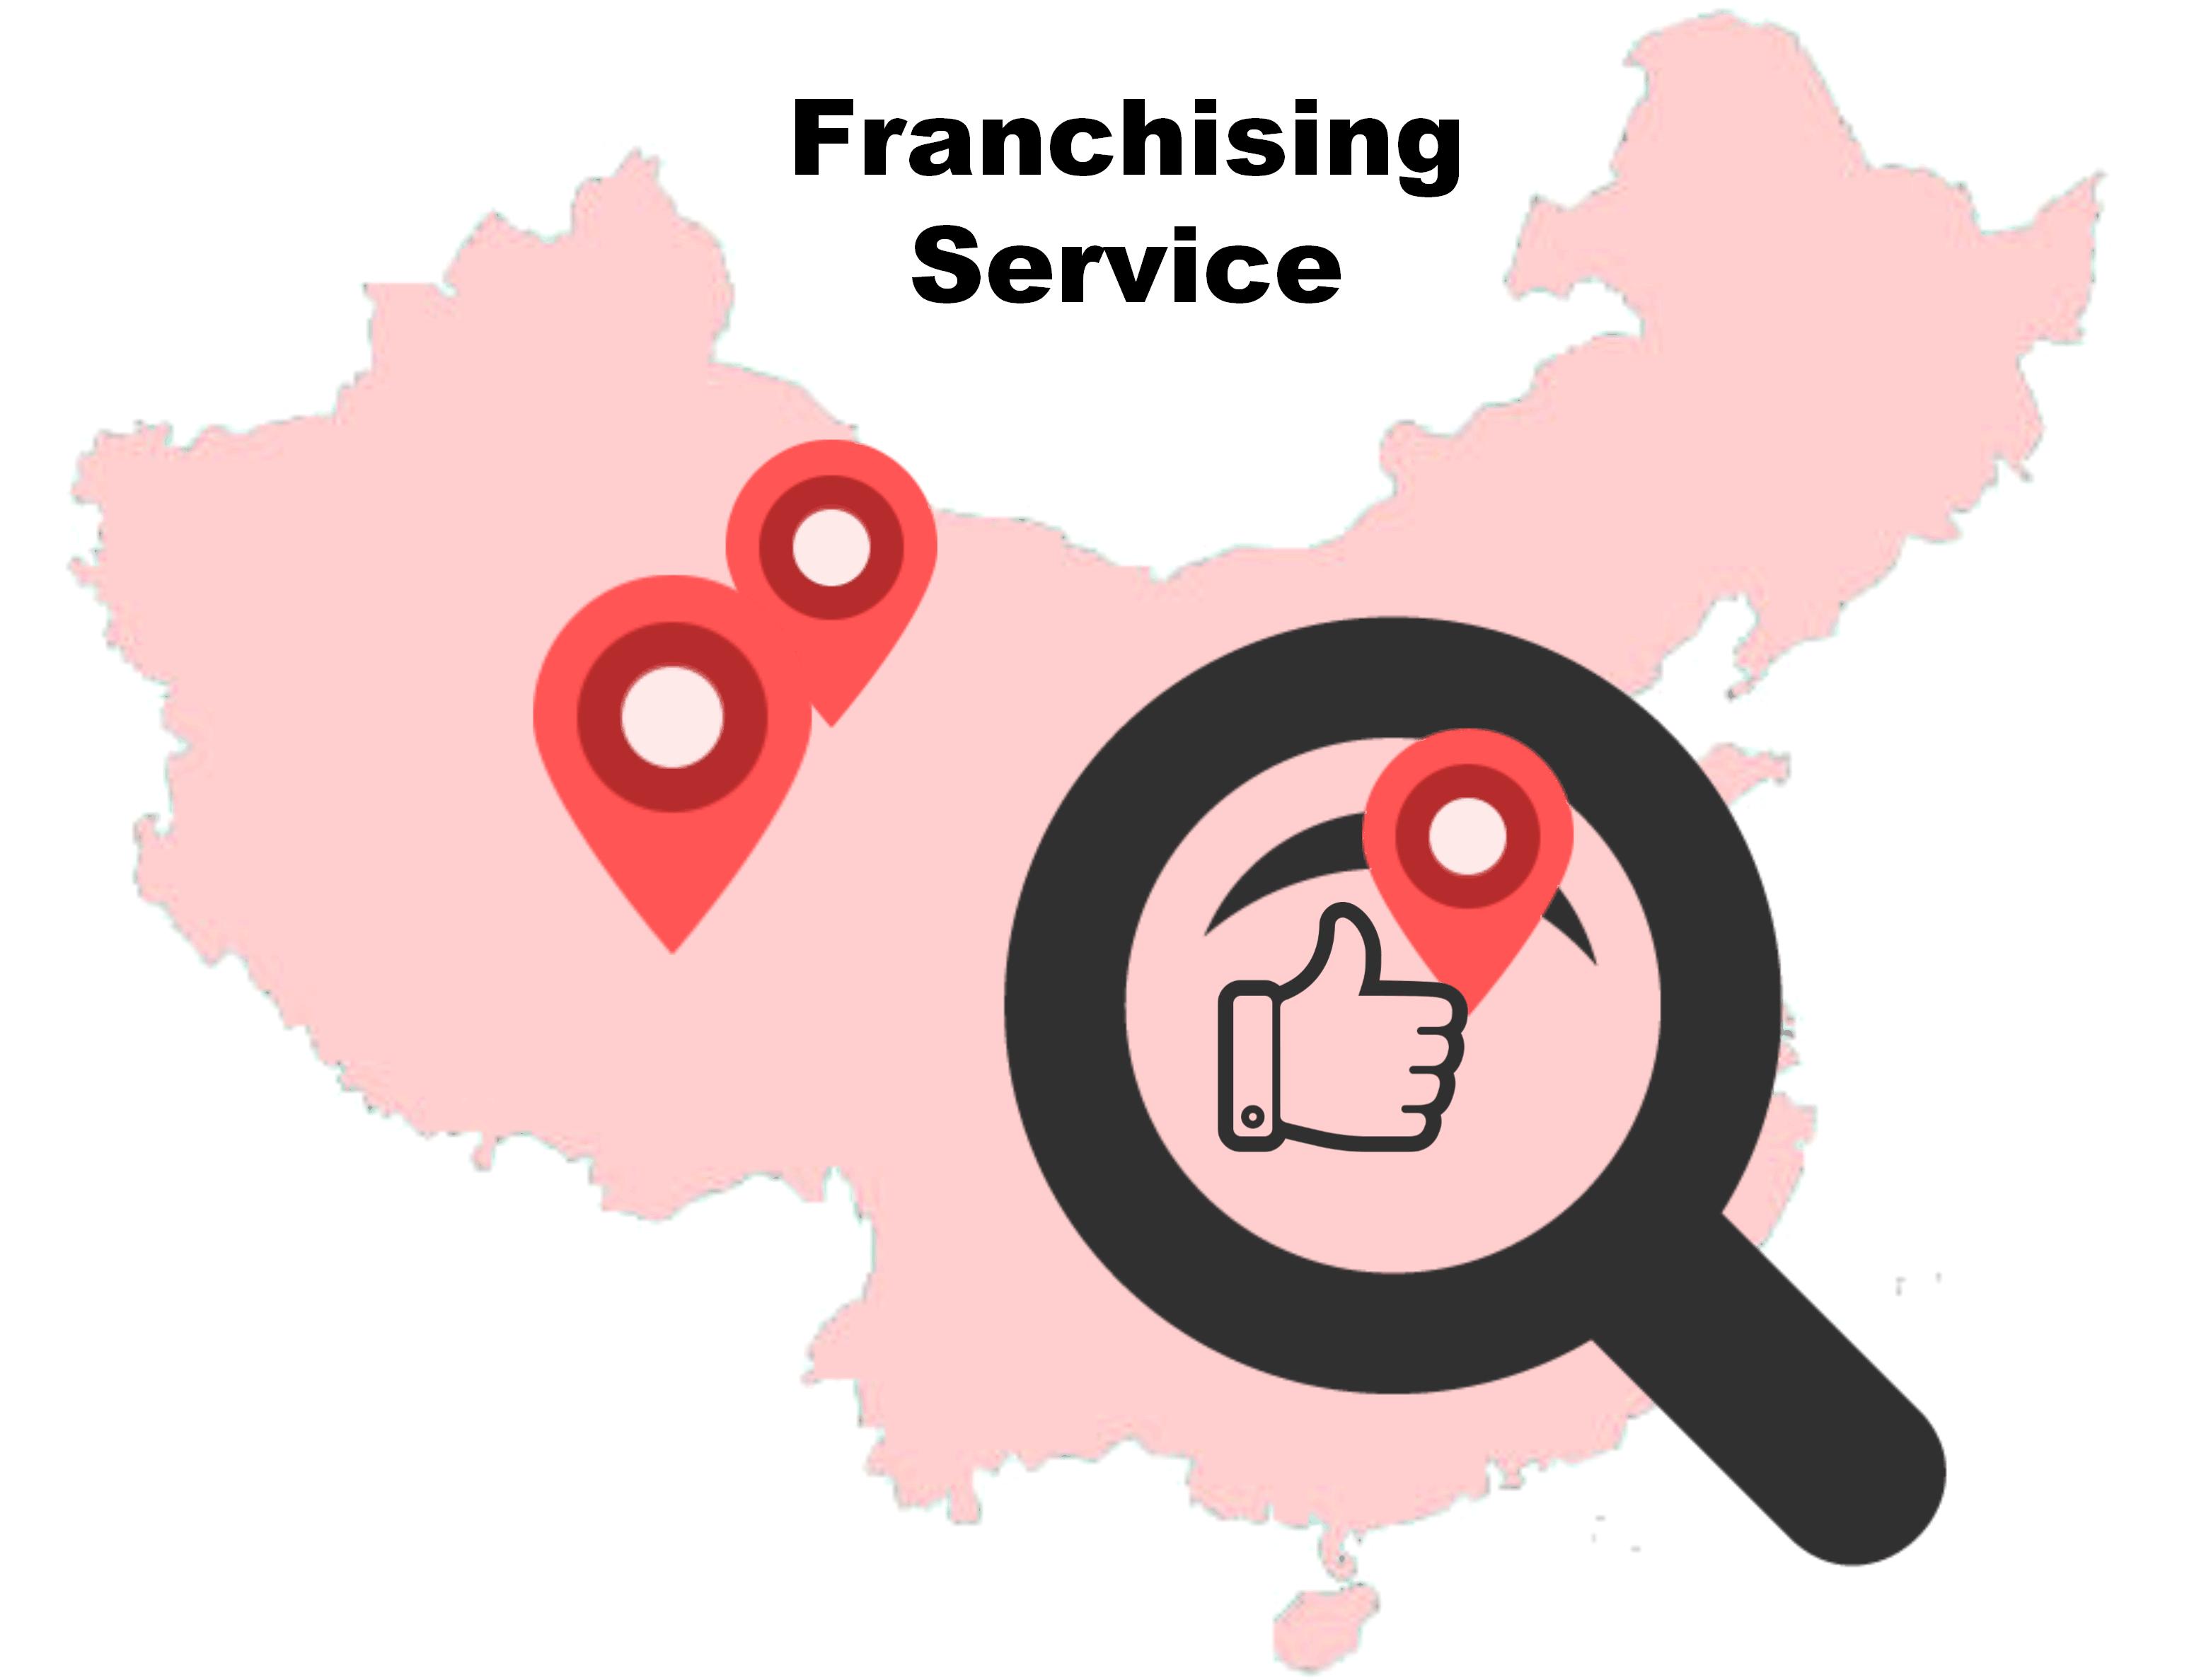 franchising-service